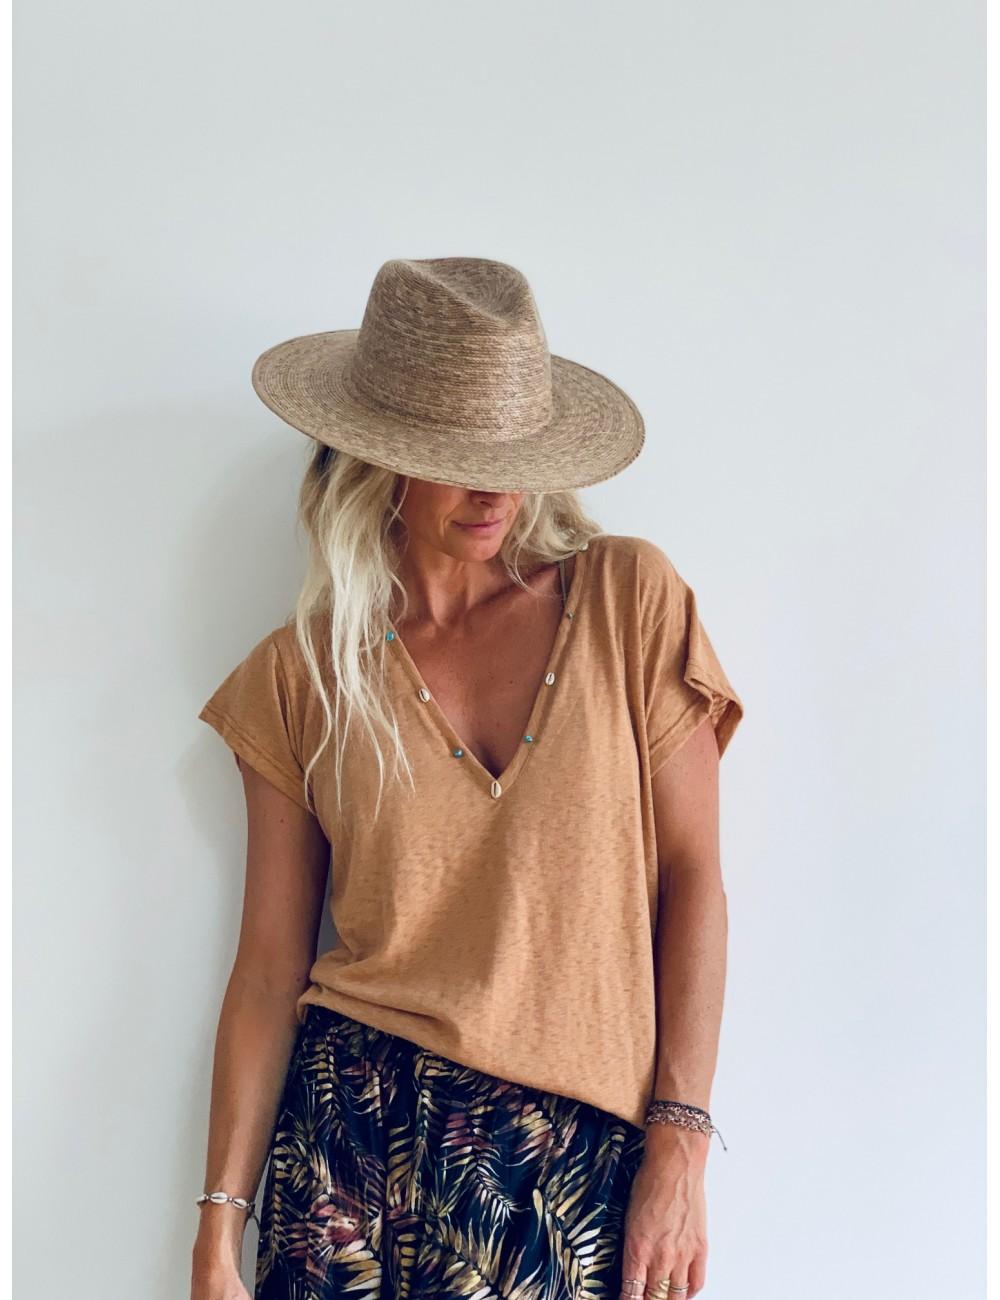 Malibu Tee - Collection spring summer 2020 - Ematesse